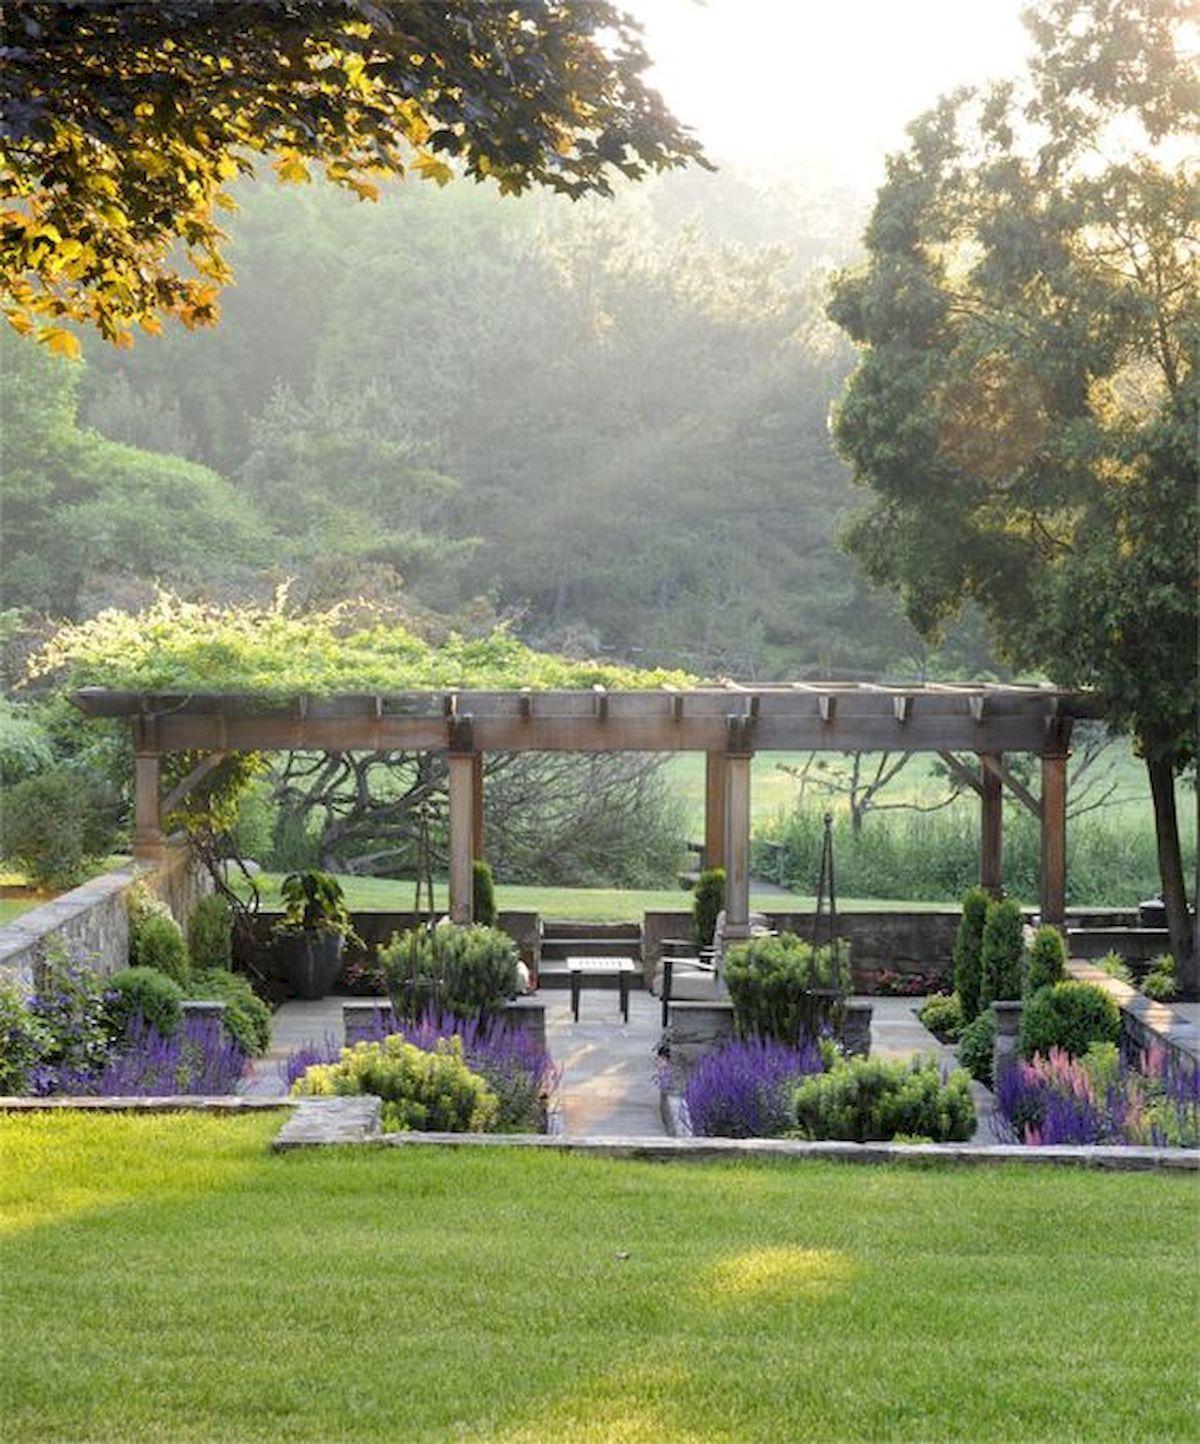 60 Beautiful Backyard Garden Design Ideas And Remodel #beautifulbackyards